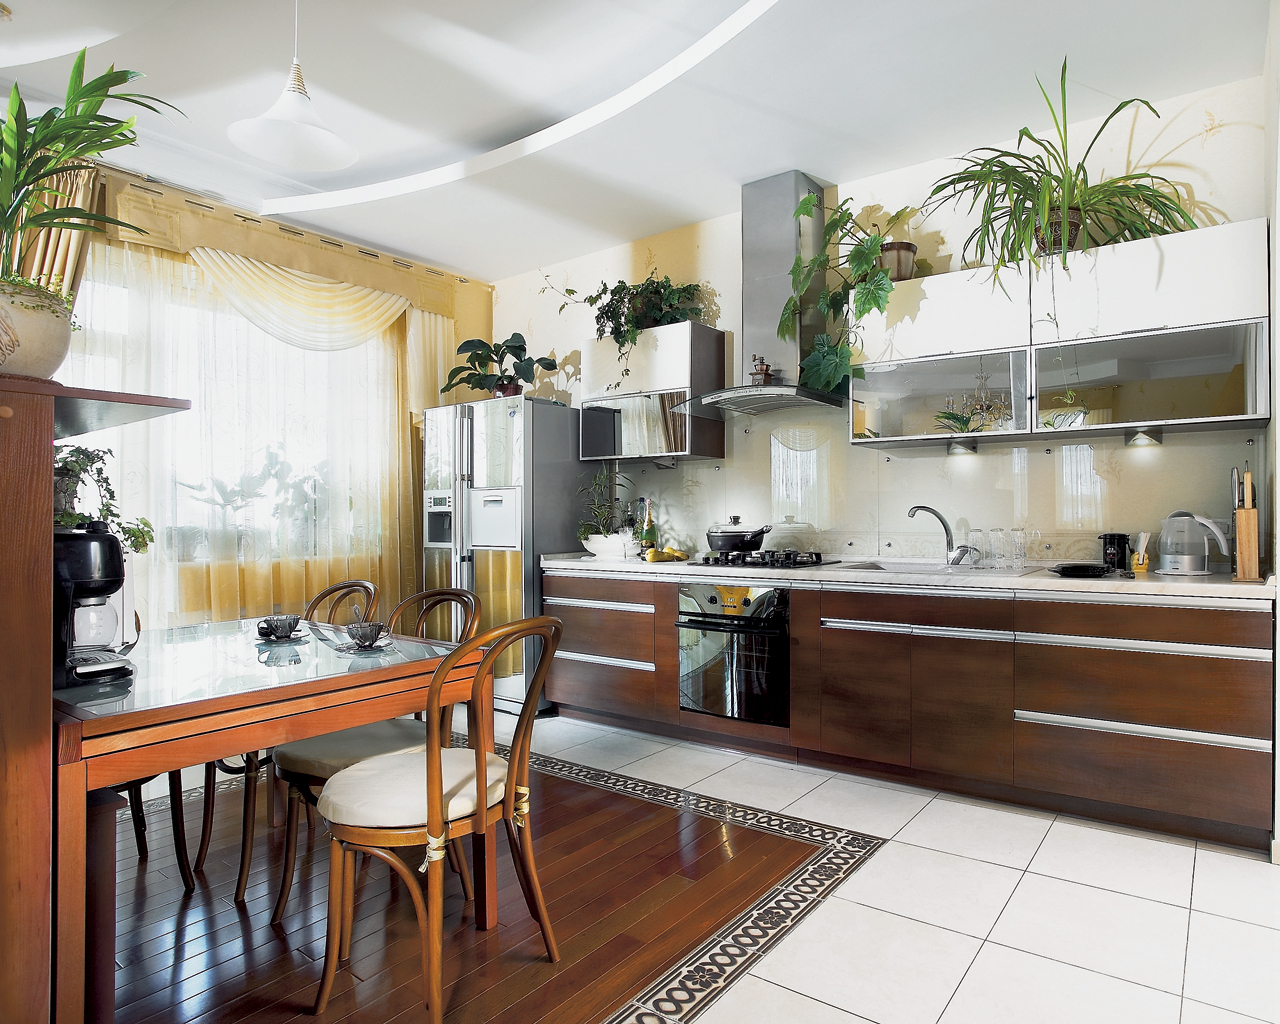 следует картинки цветов для дизайна кухни фото характеристики